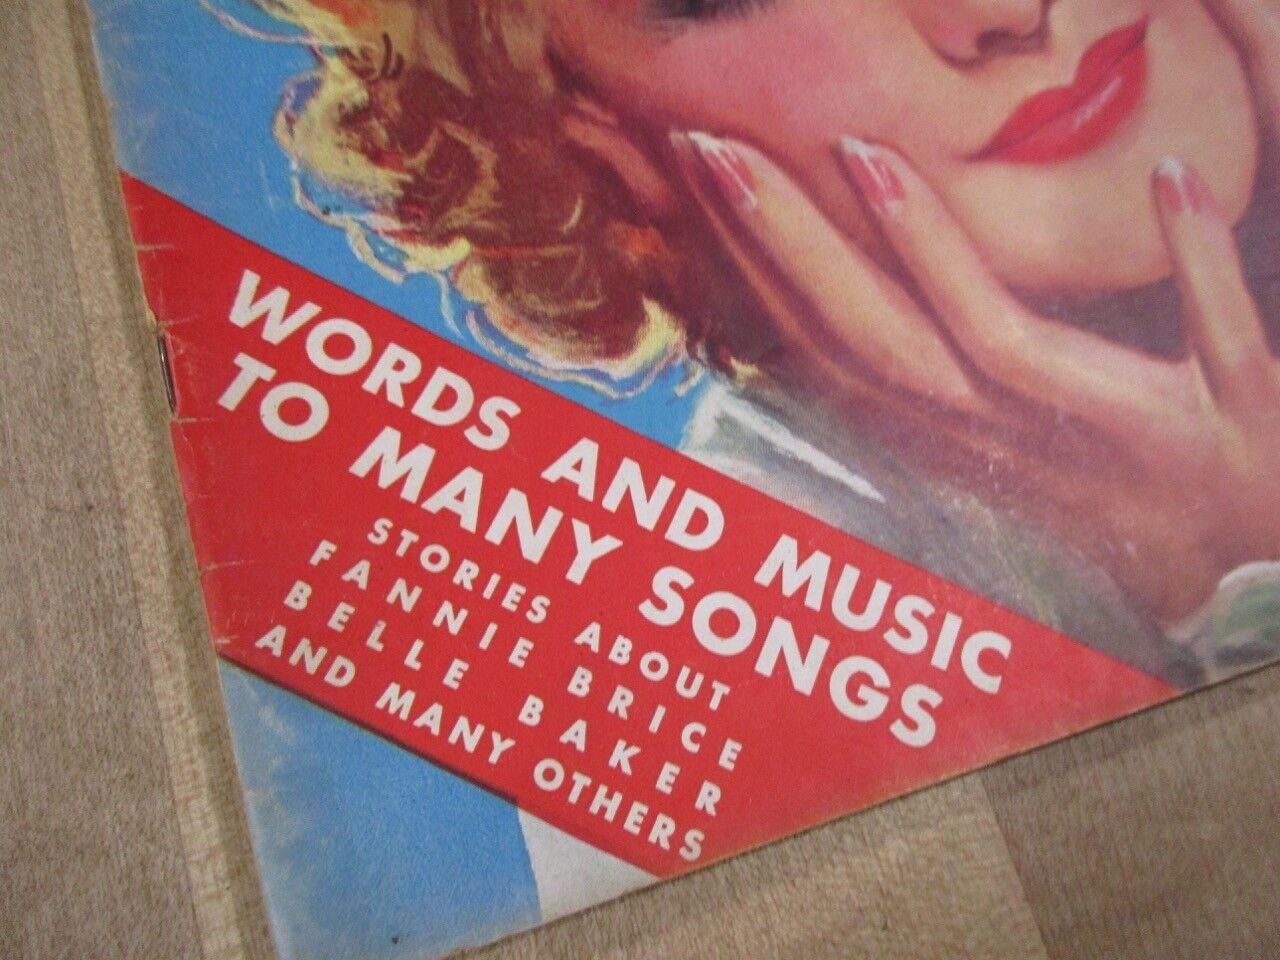 Popular Songs September 1936 Patti Pickens Fannie Brice Reisers Britton Band  - $7.99